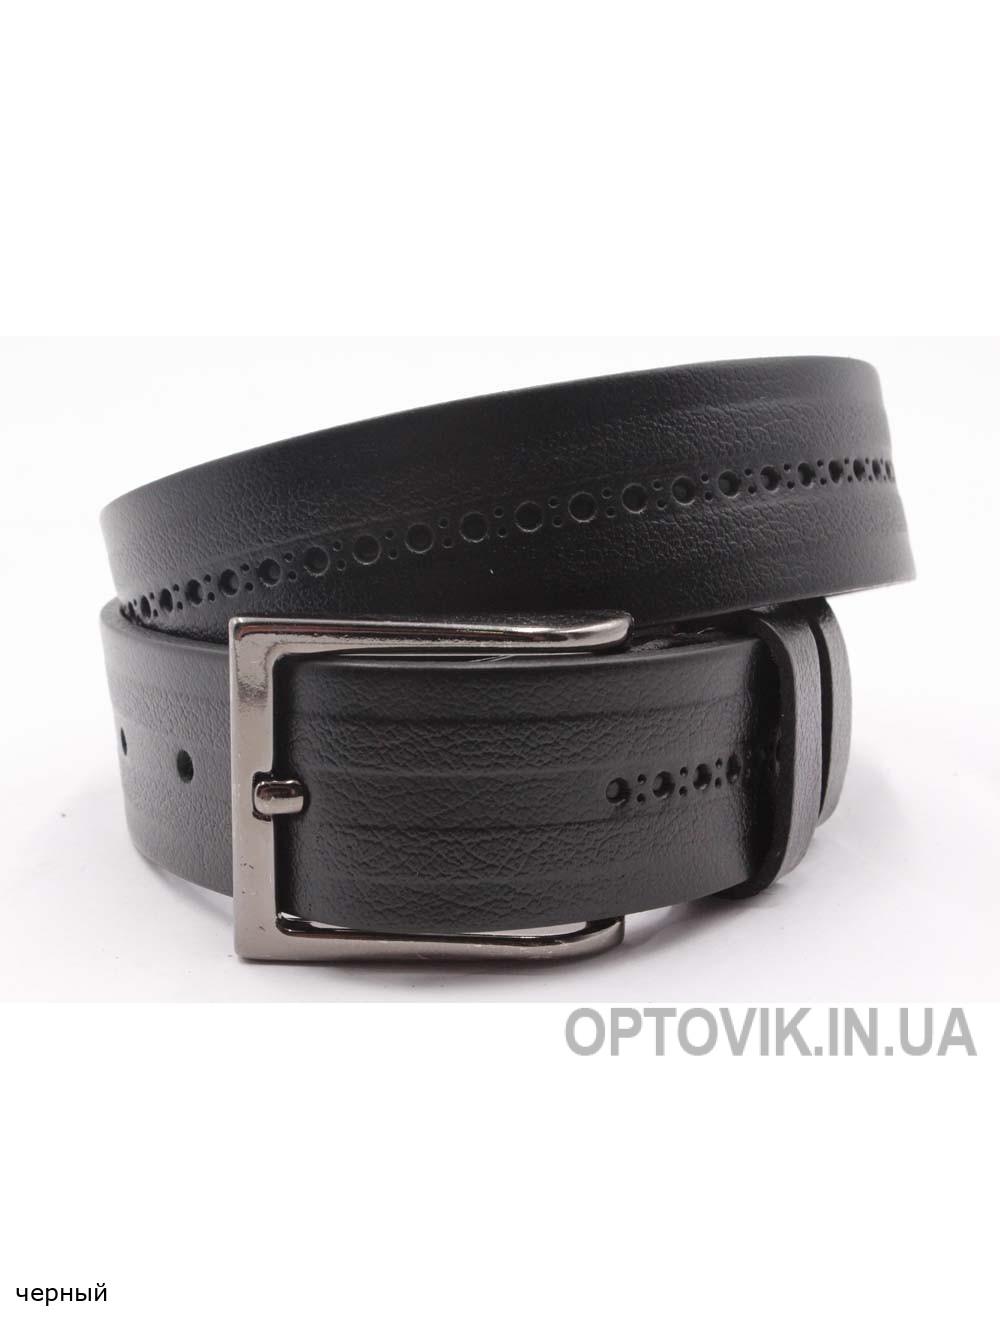 Ремень кожа 35 Real Leather - 1rl115657